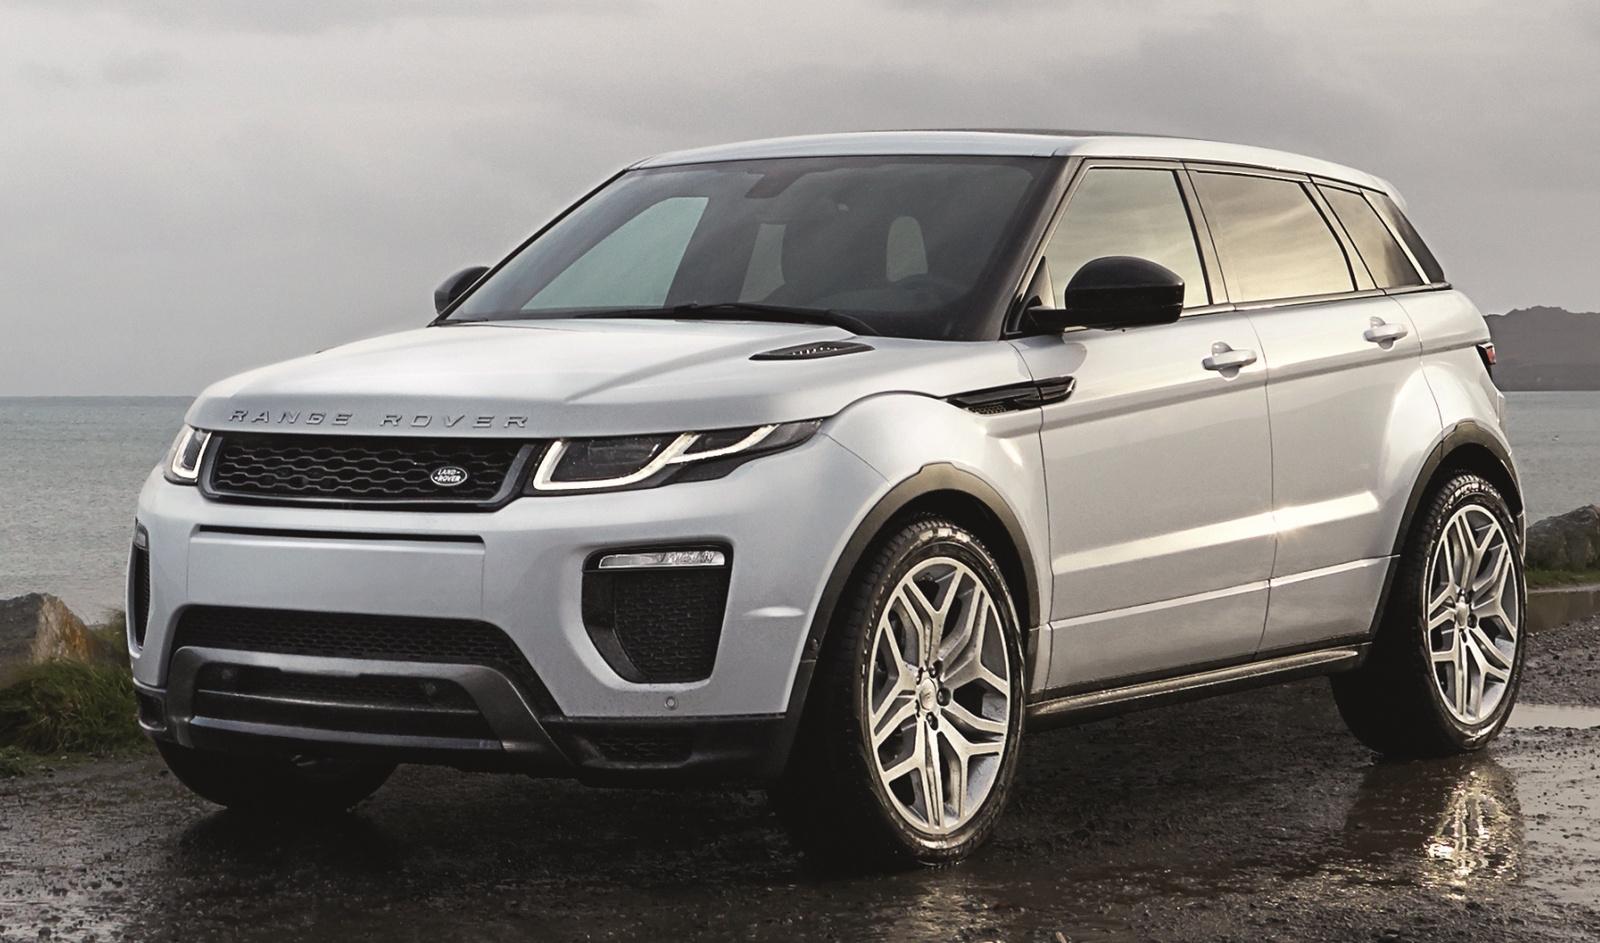 2017 Range Rover Configurations >> 2016 Land Rover Range Rover Evoque Overview Cargurus